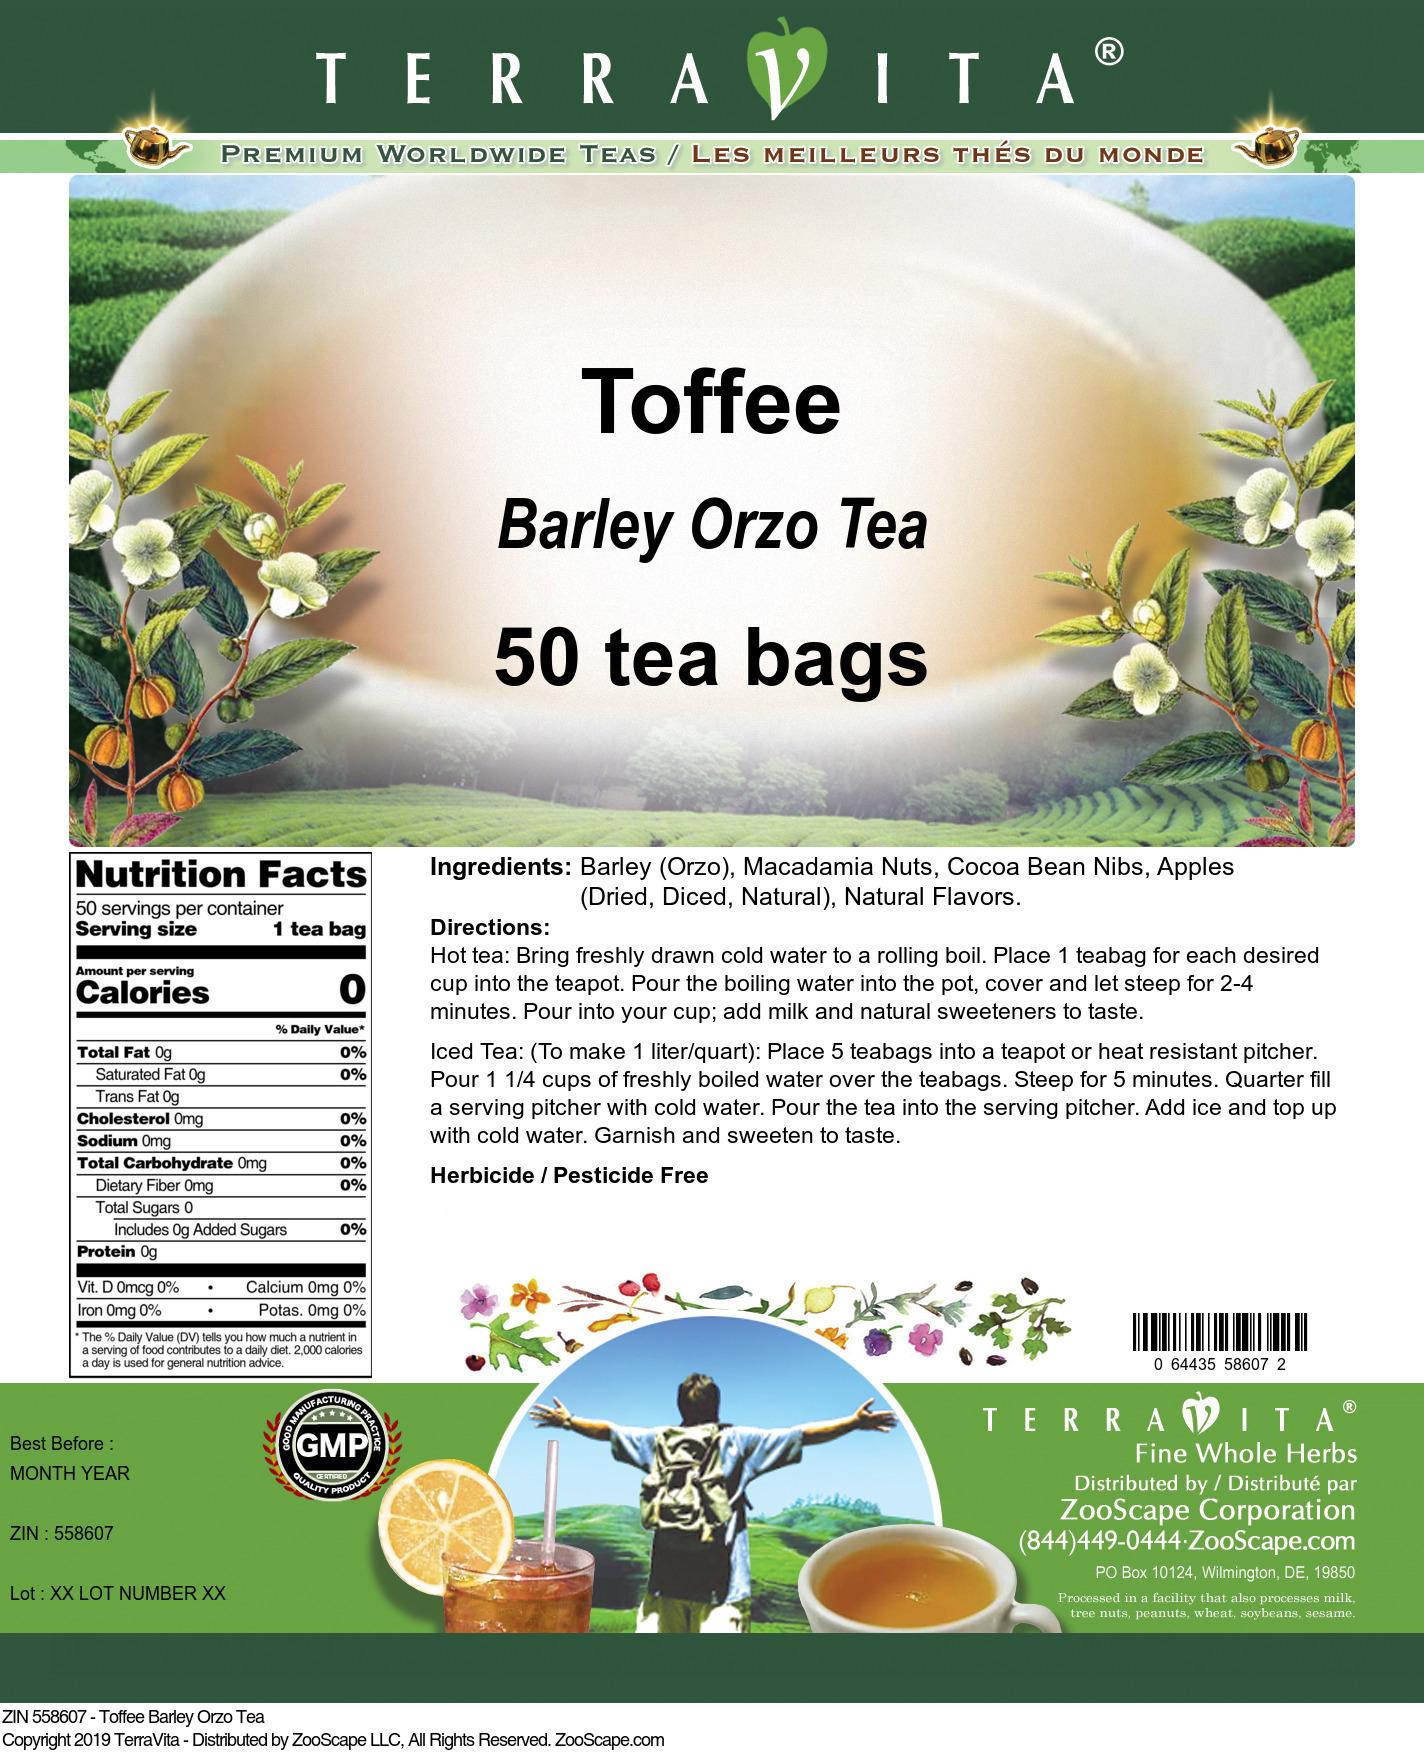 Toffee Barley Orzo